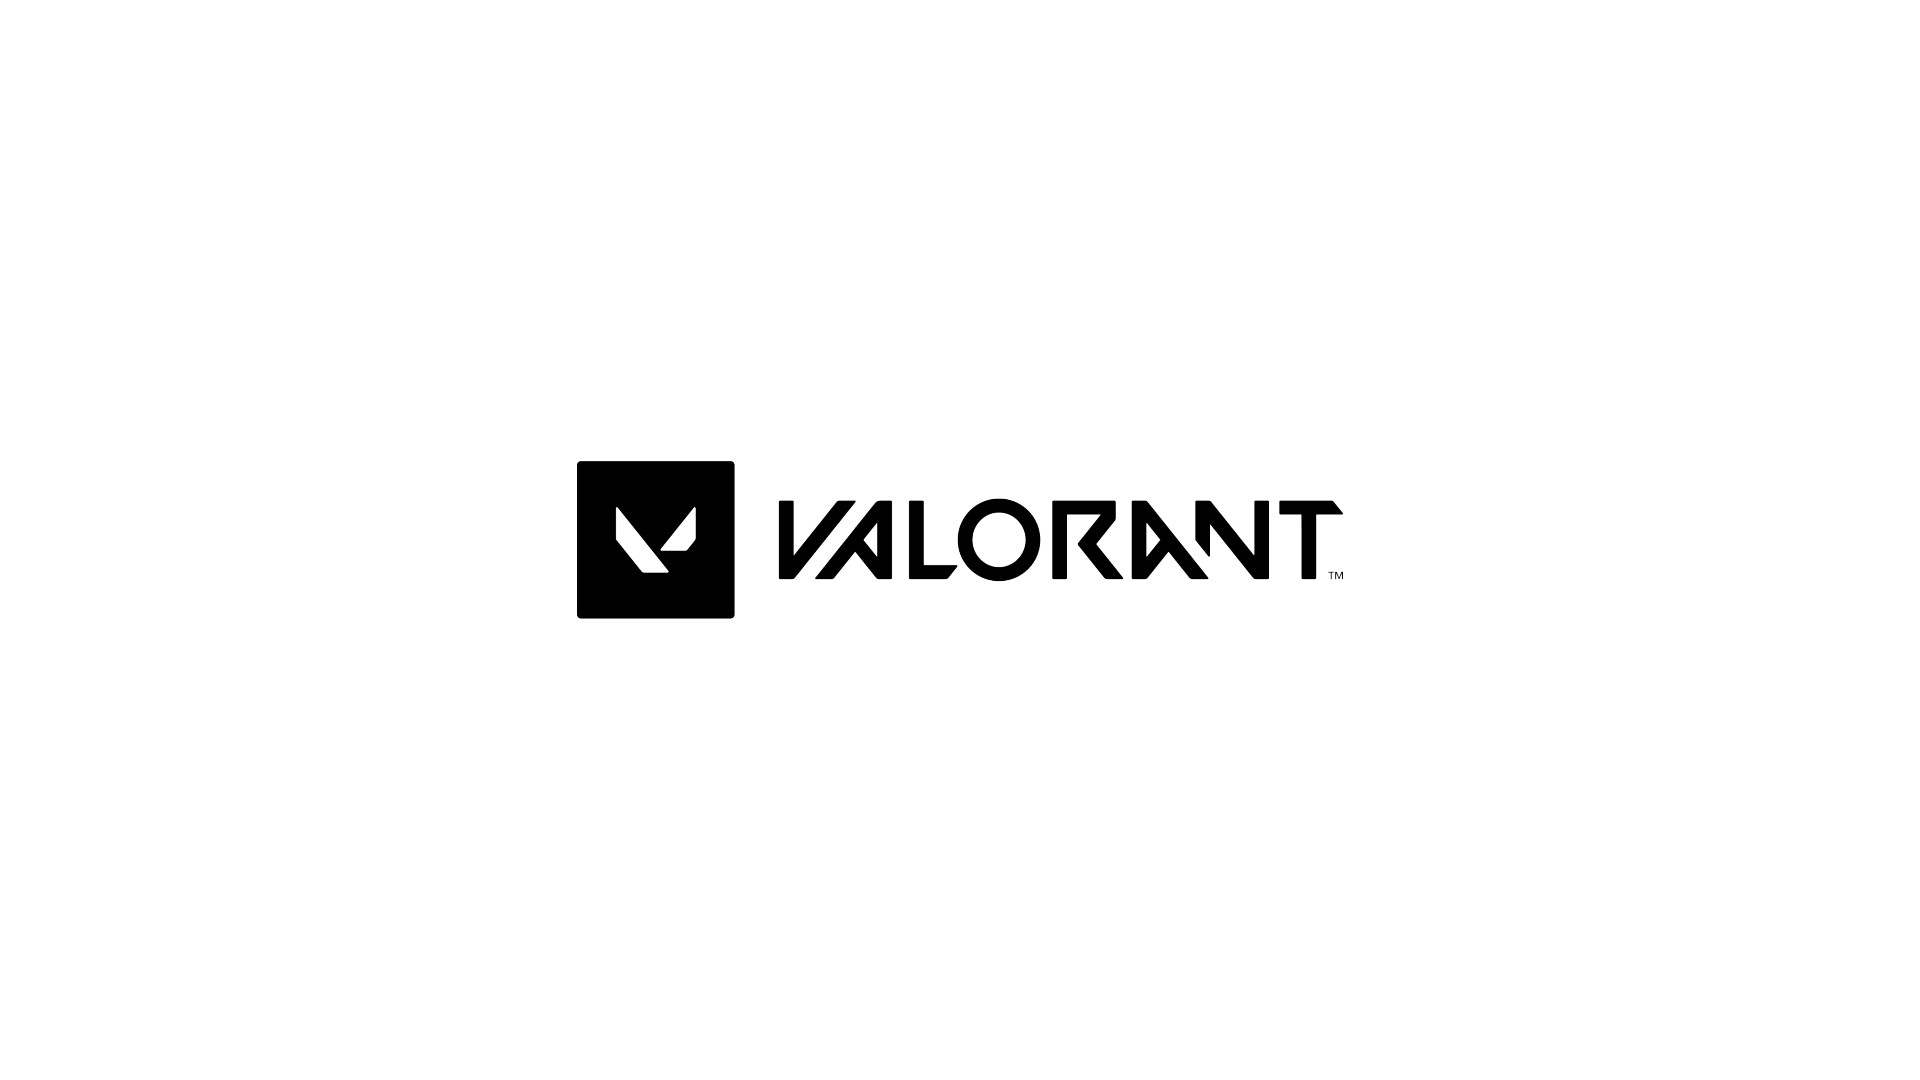 Valorant HD Wallpaper